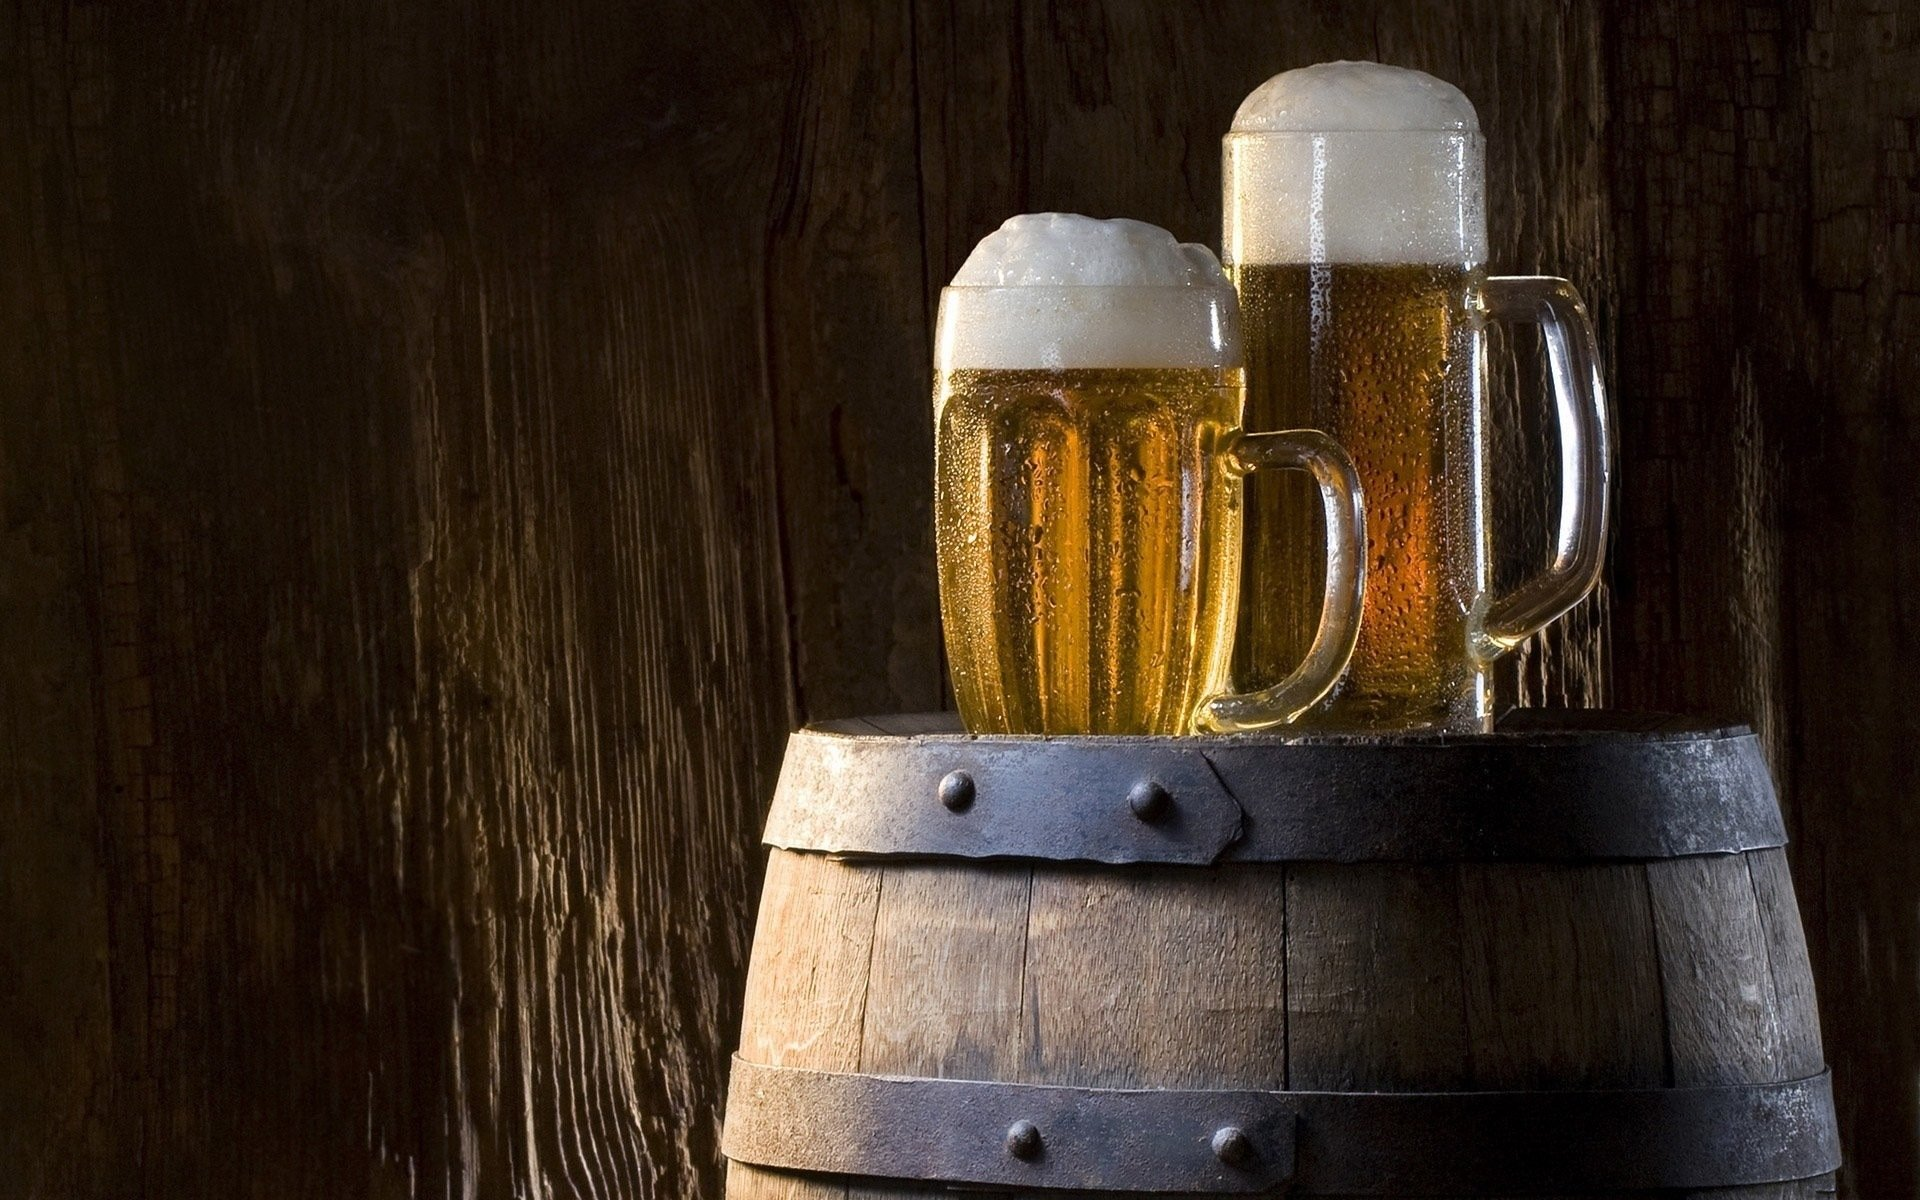 пиво в бочонках фото снимки